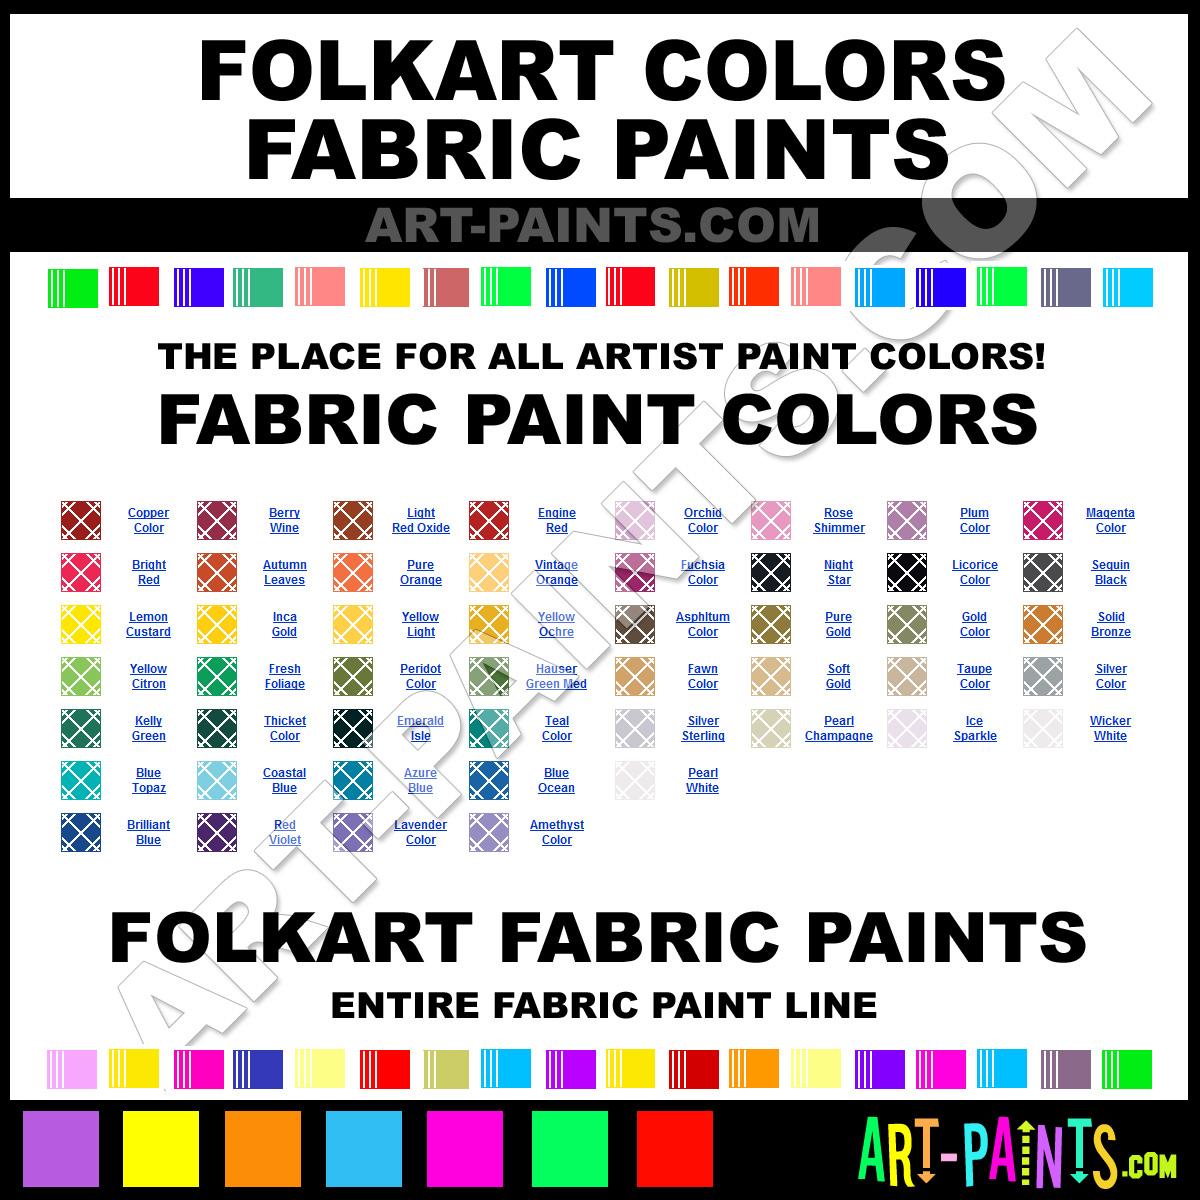 Folk art acrylic paint color chart - Please Note That The Art